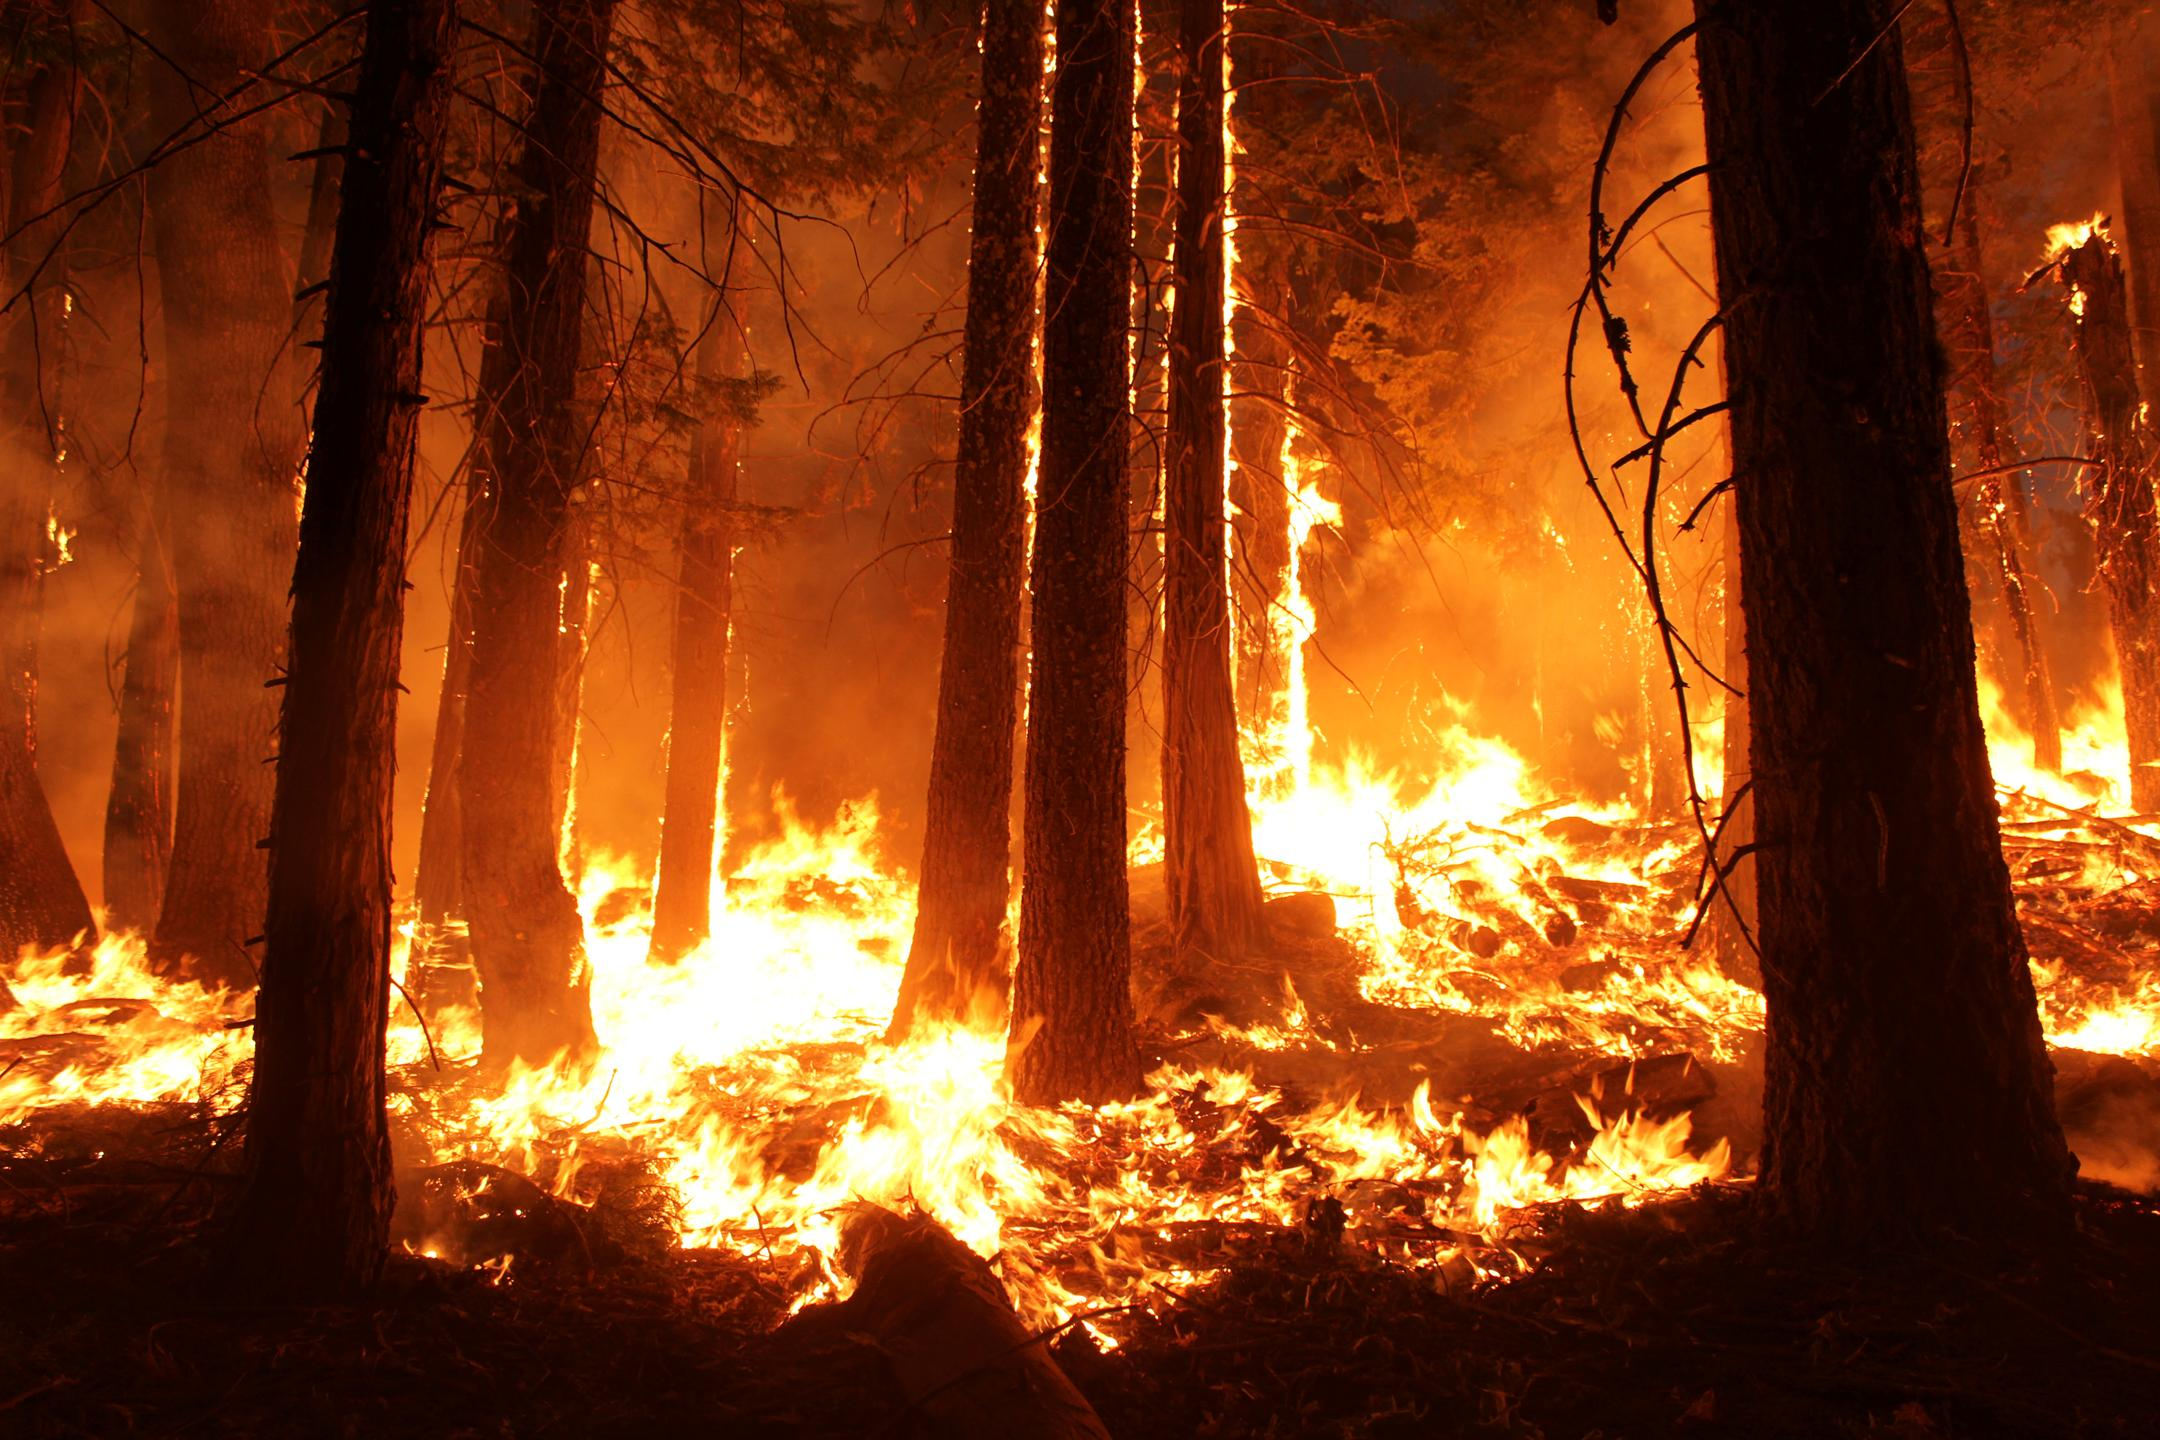 Nasa Jpl S Aviris Classic Data Used To Help Recovery From California Megafires